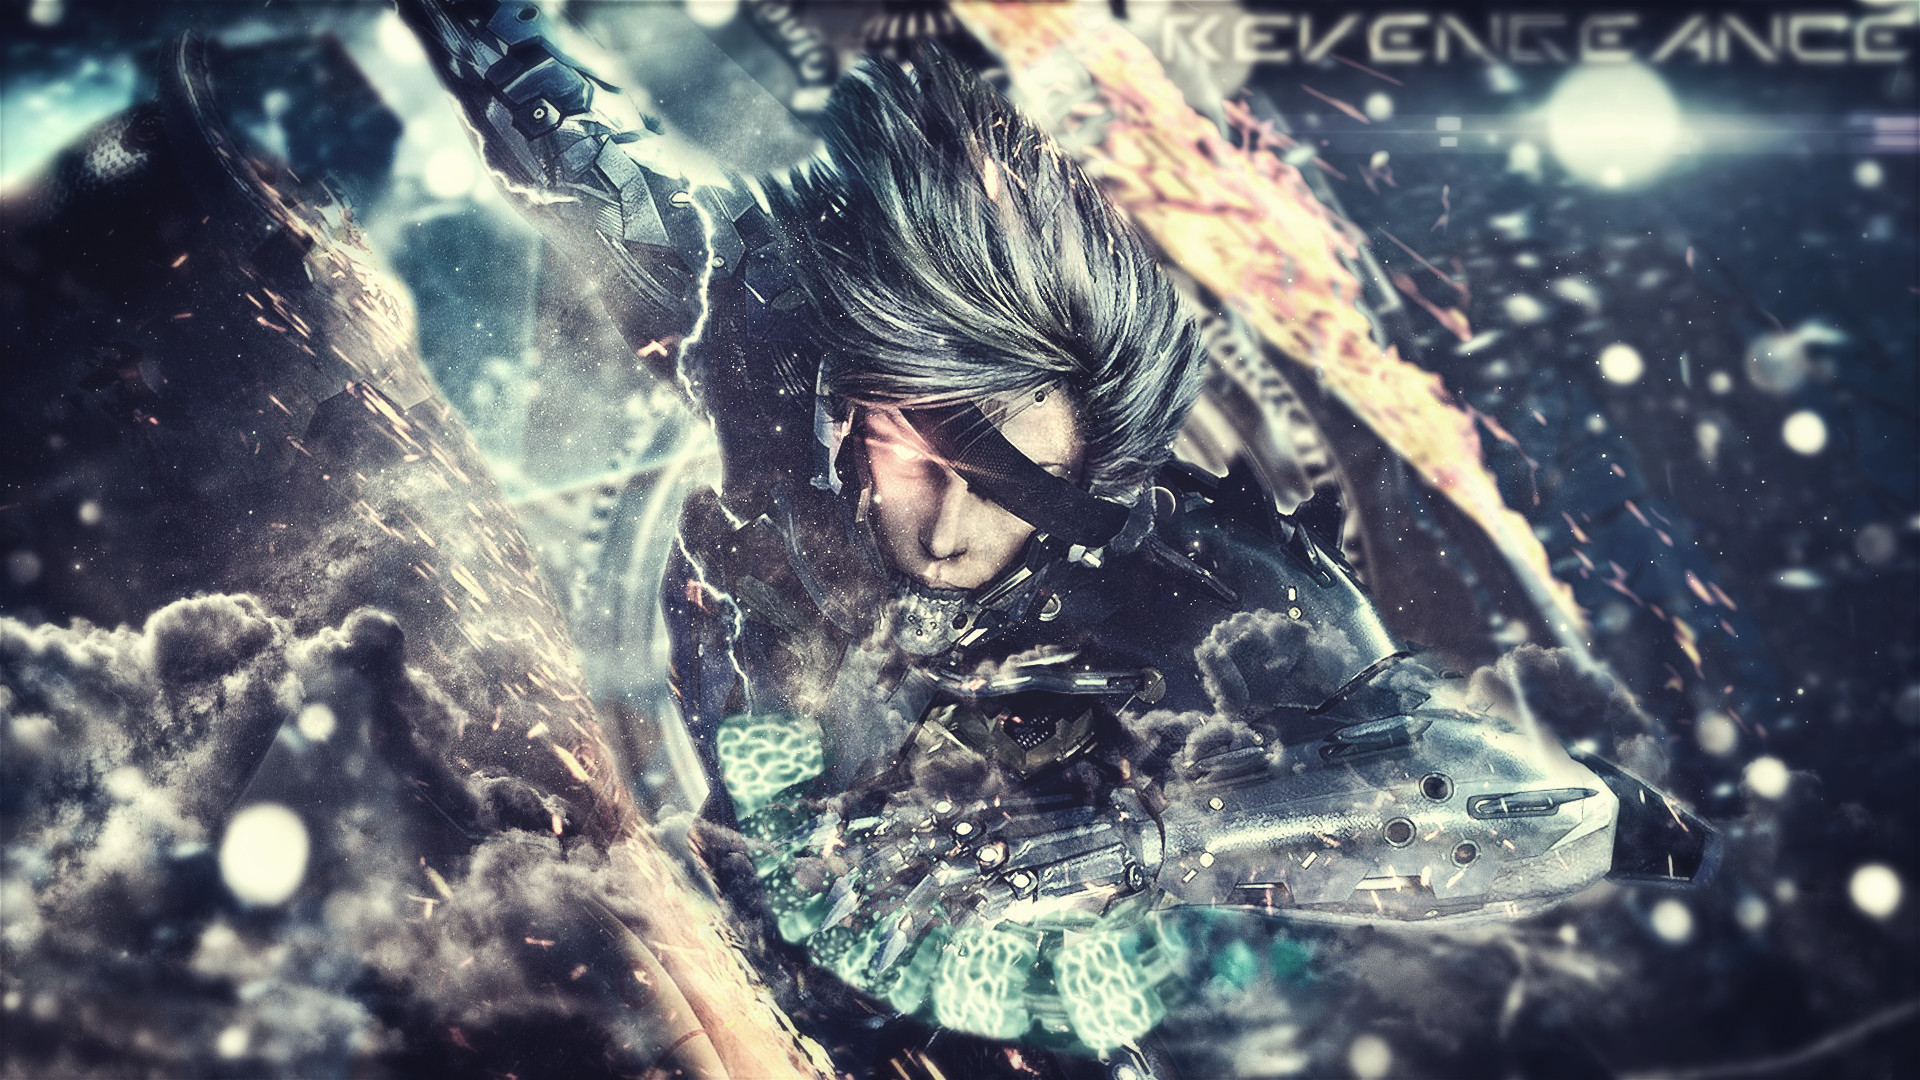 Res: 1920x1080, Video Game - Metal Gear Rising: Revengeance Wallpaper